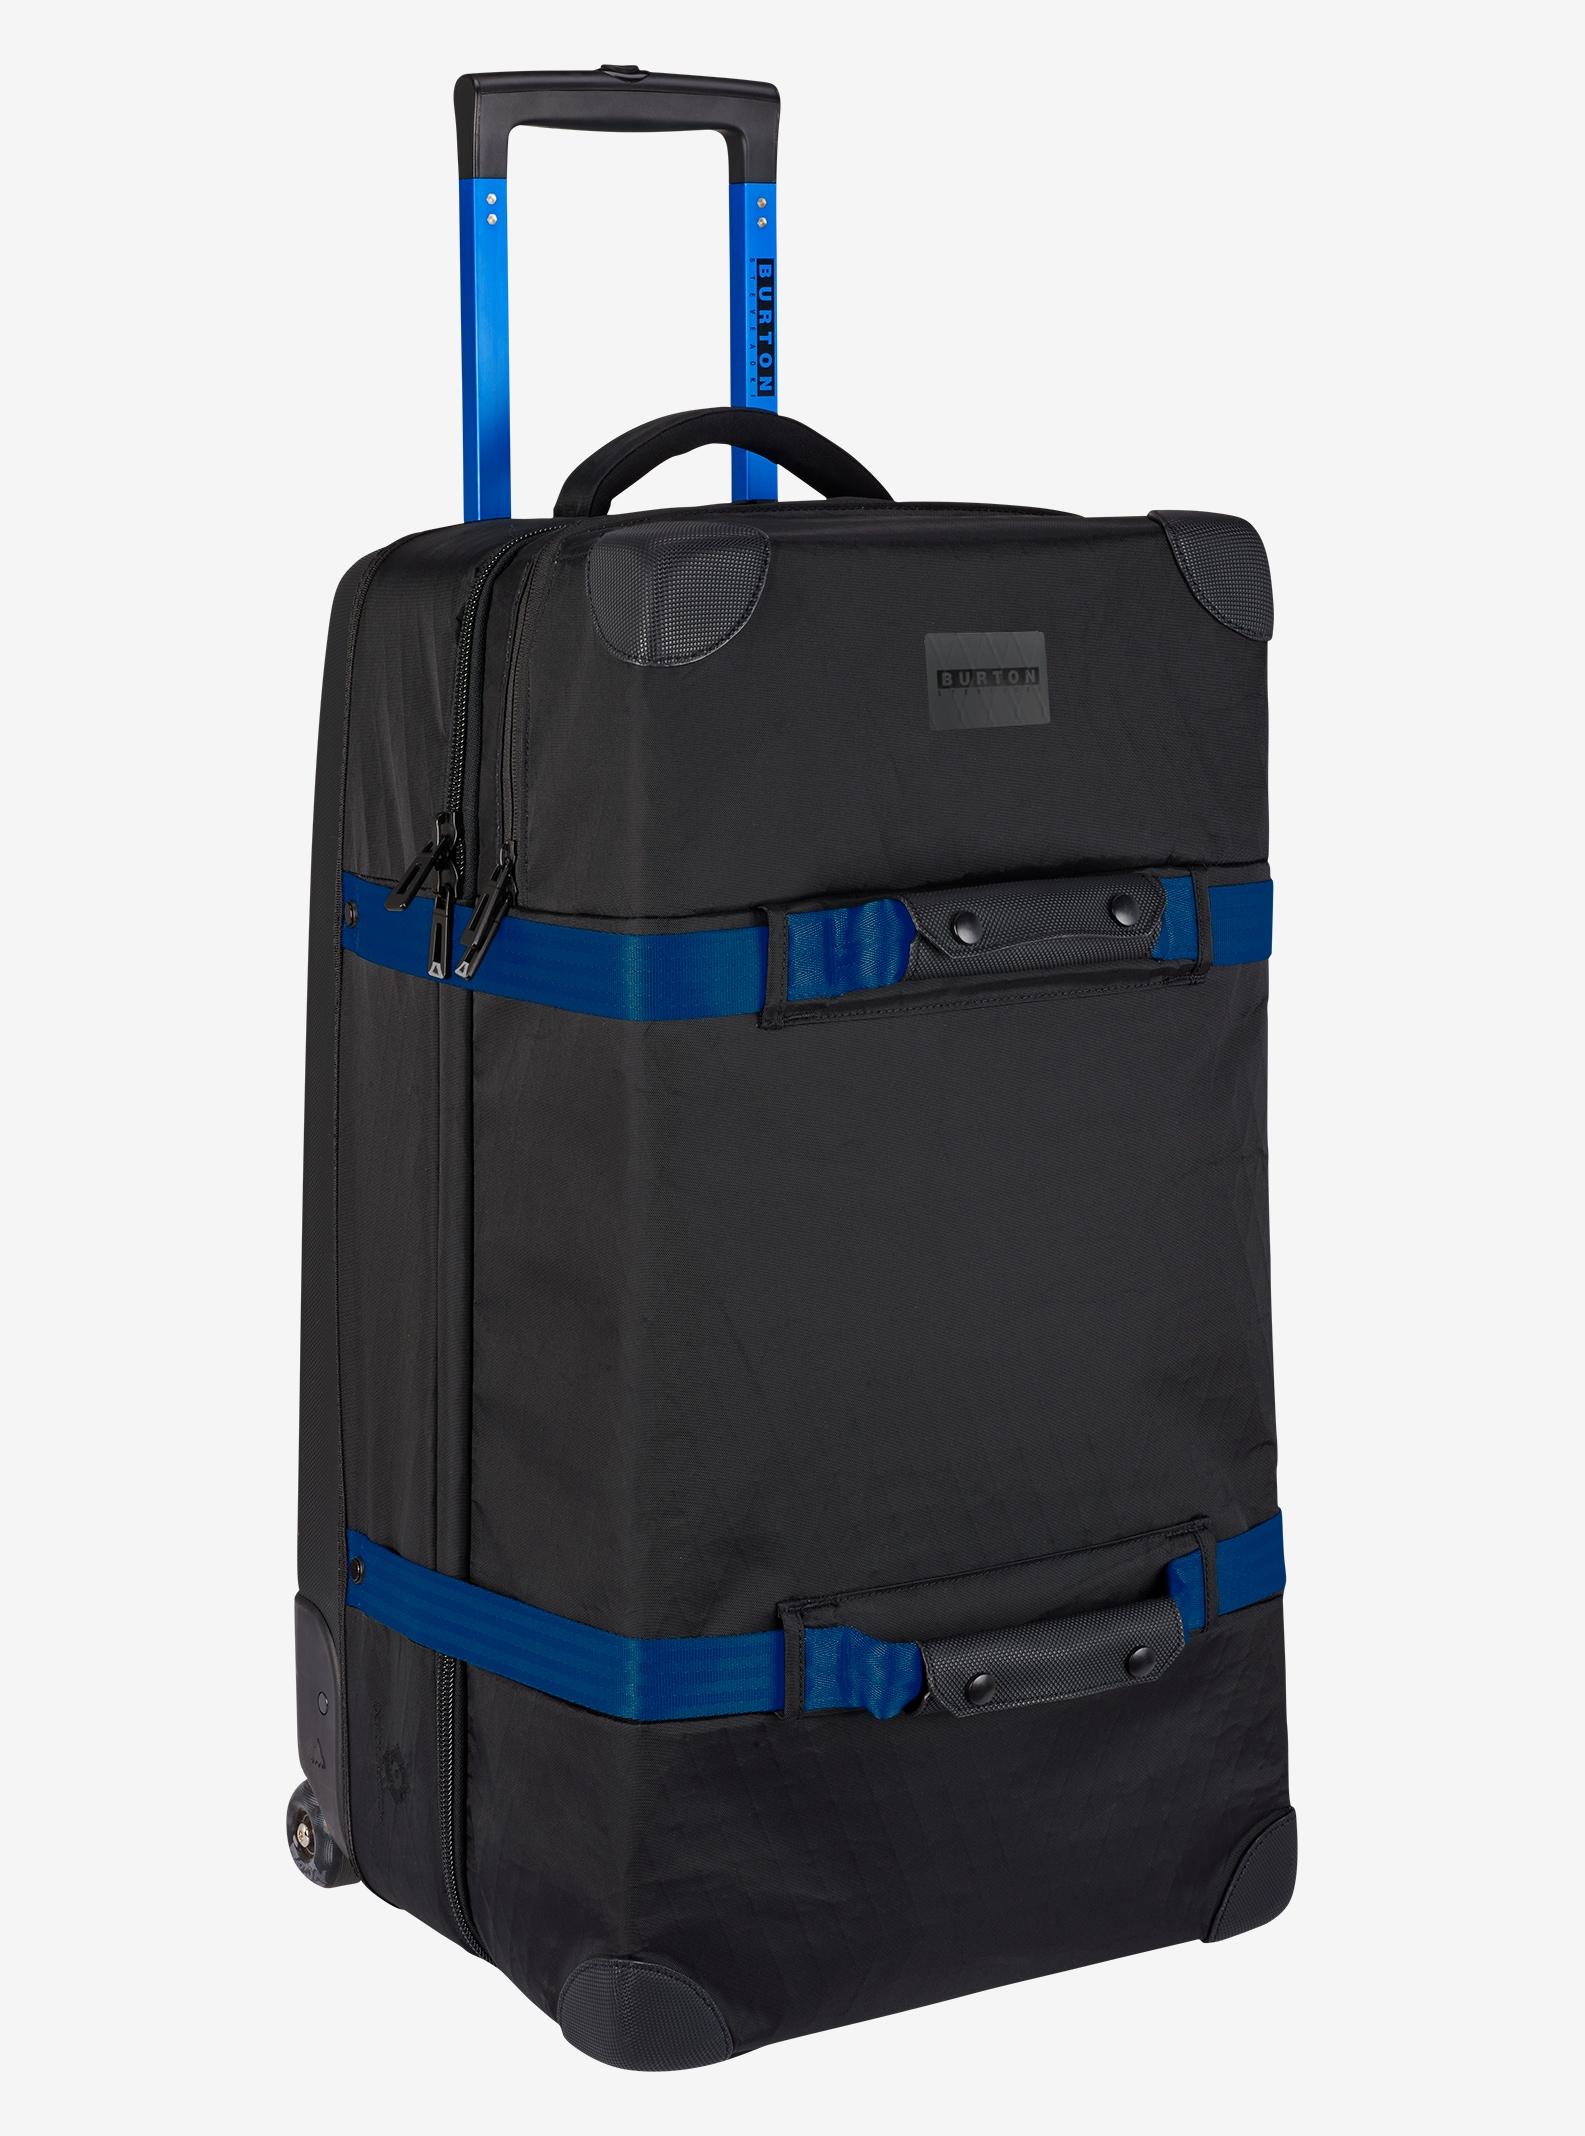 Burton x Aoki Wheelie Double Deck Travel Bag shown in Aoki Black